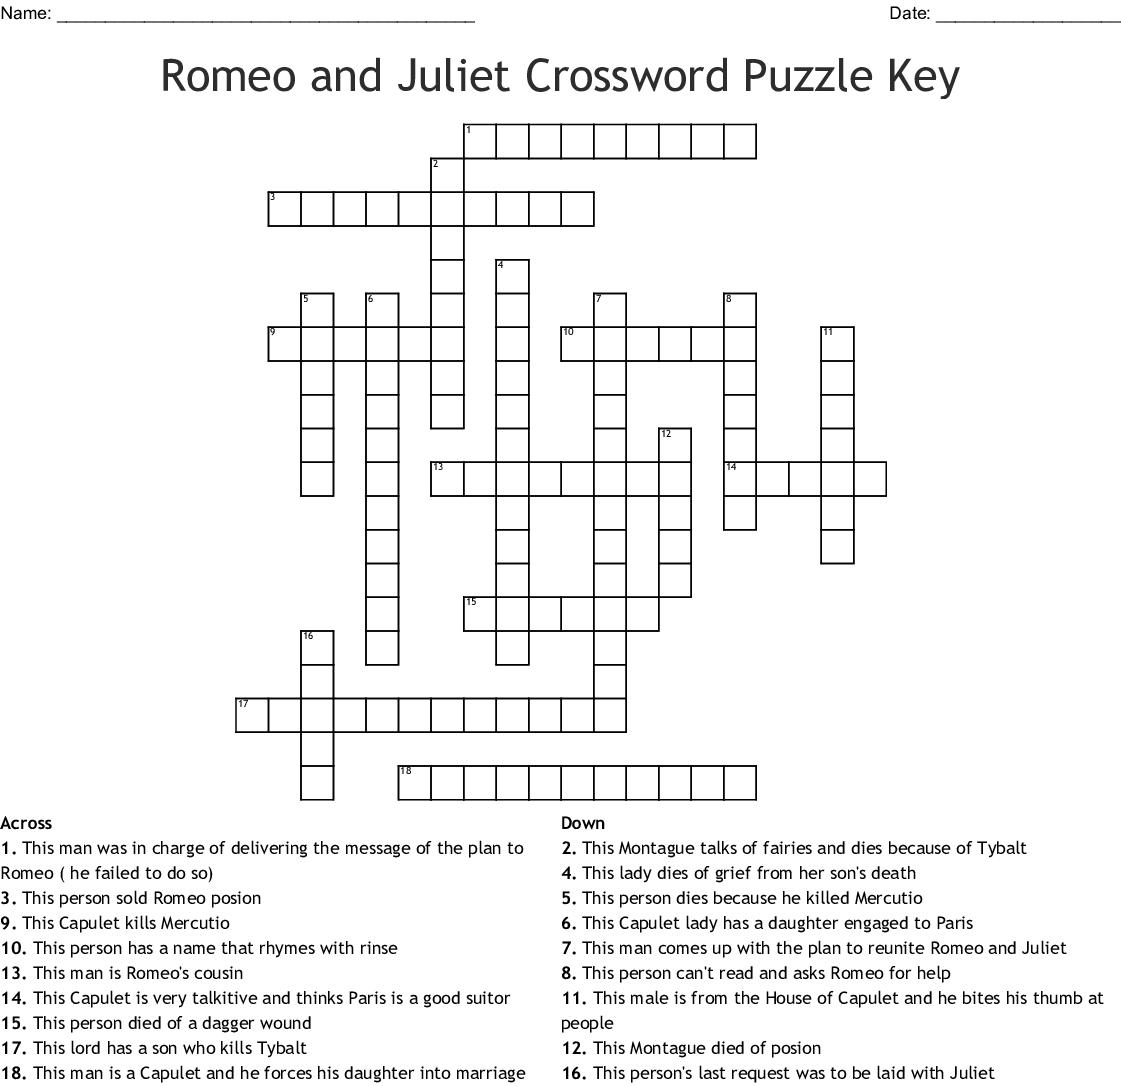 Romeo And Juliet Crossword Puzzle Key Wordmint